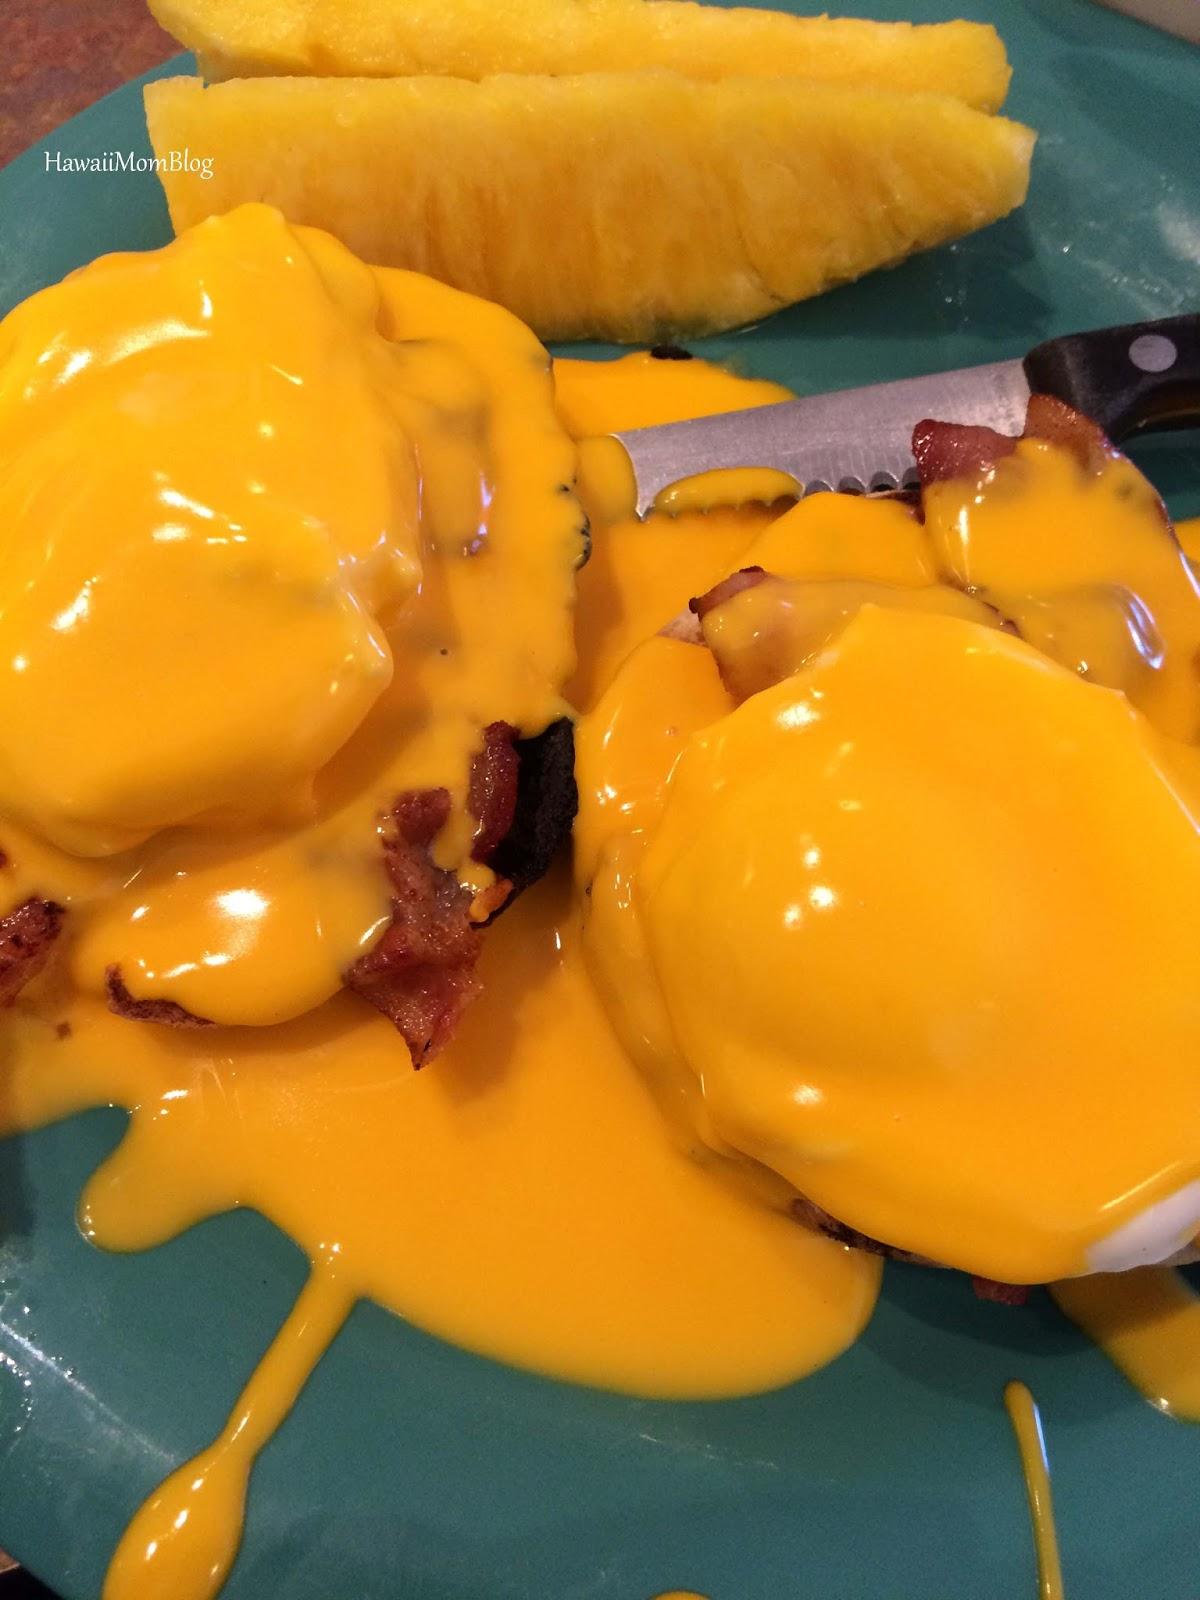 Hawaii Mom Blog: Visit Kauai: Kountry Style Kitchen